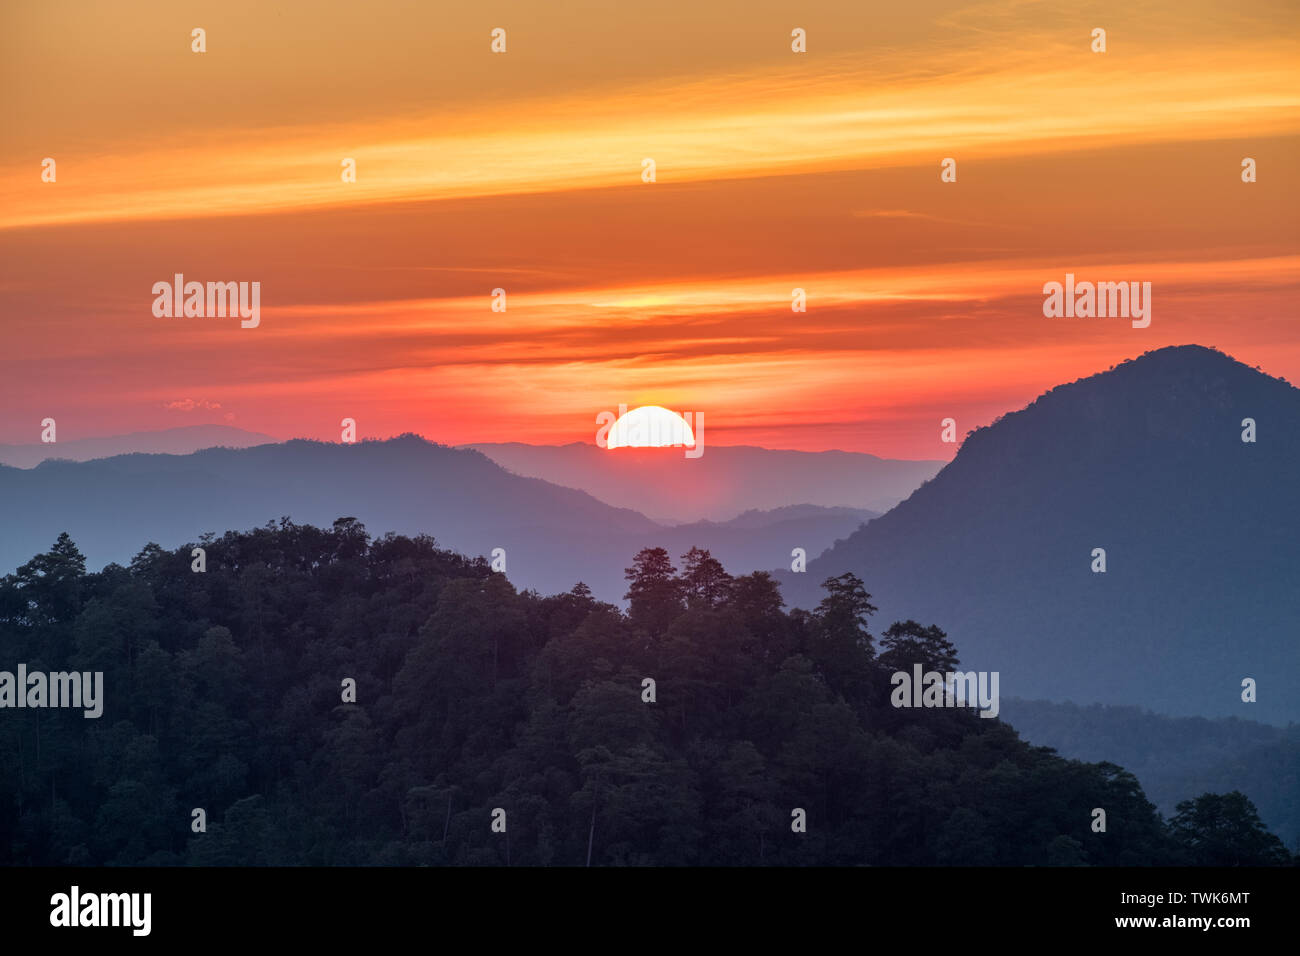 Viewpoint doi kiew lom at sunset,mae hong son,thailand - Stock Image